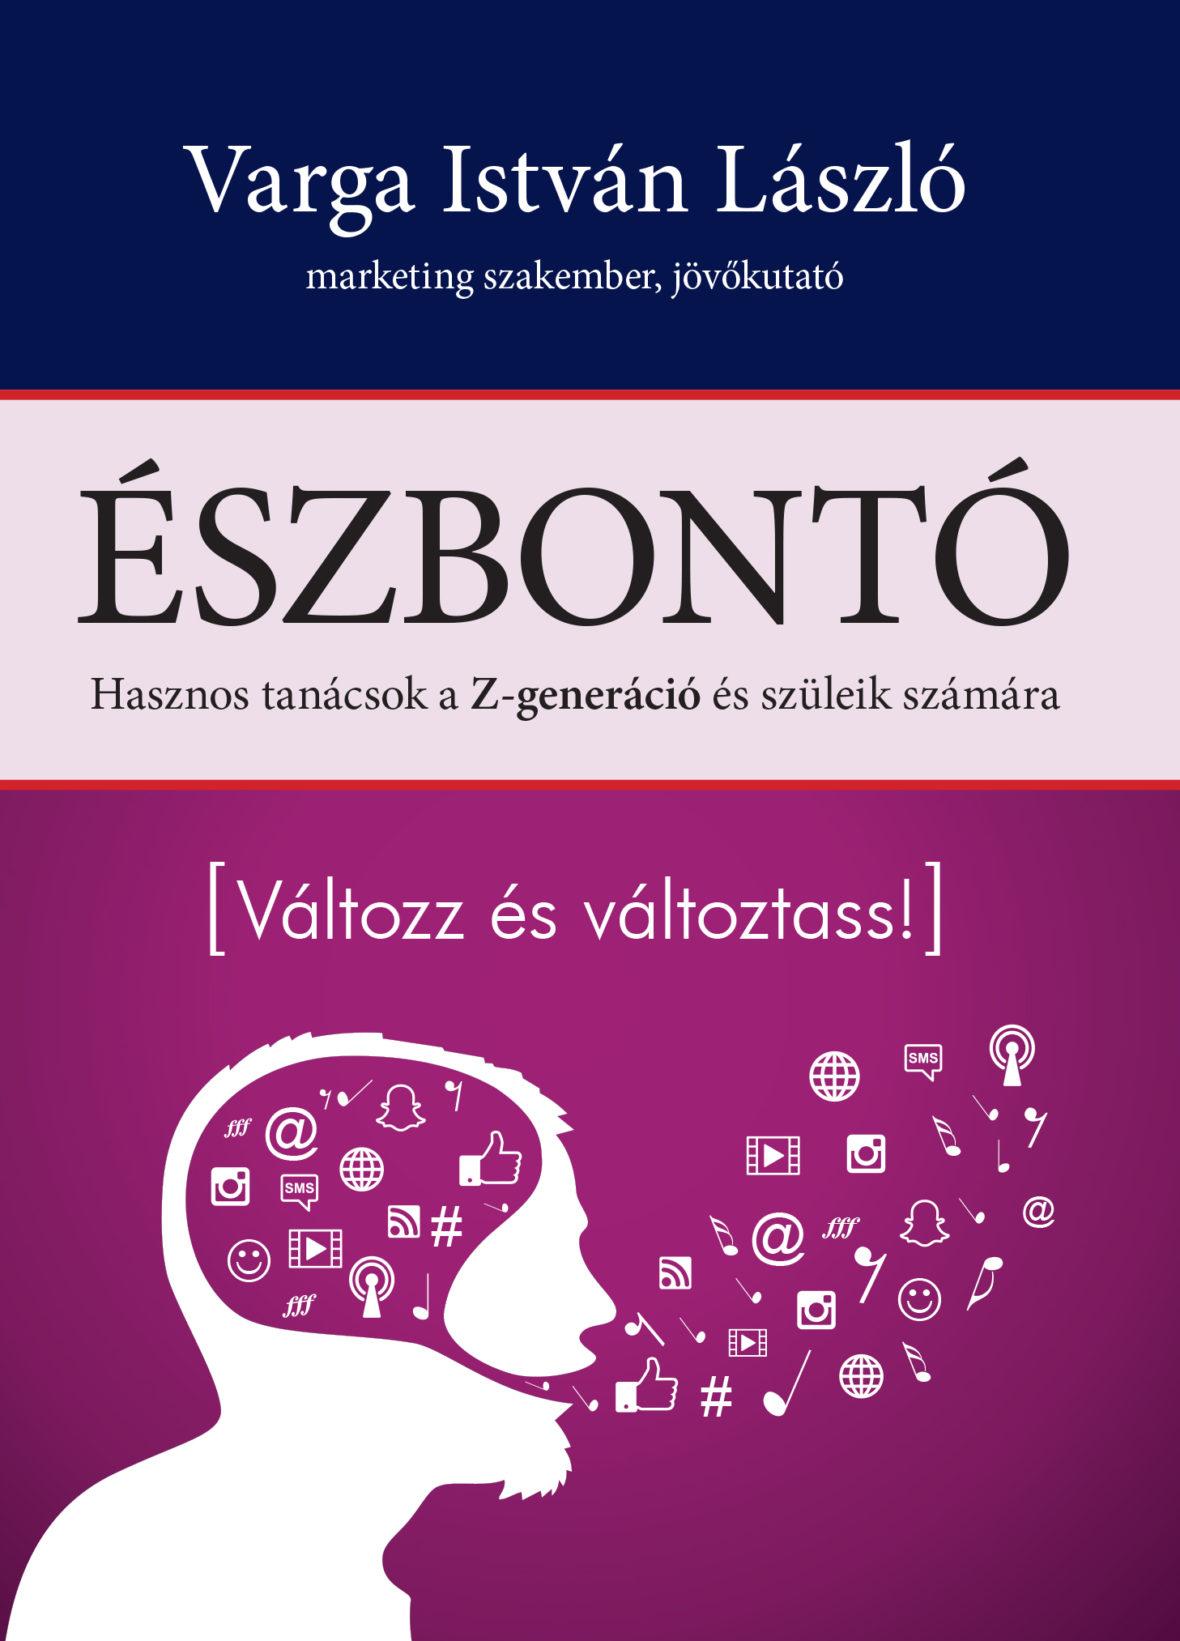 Eszbonto_borito_big